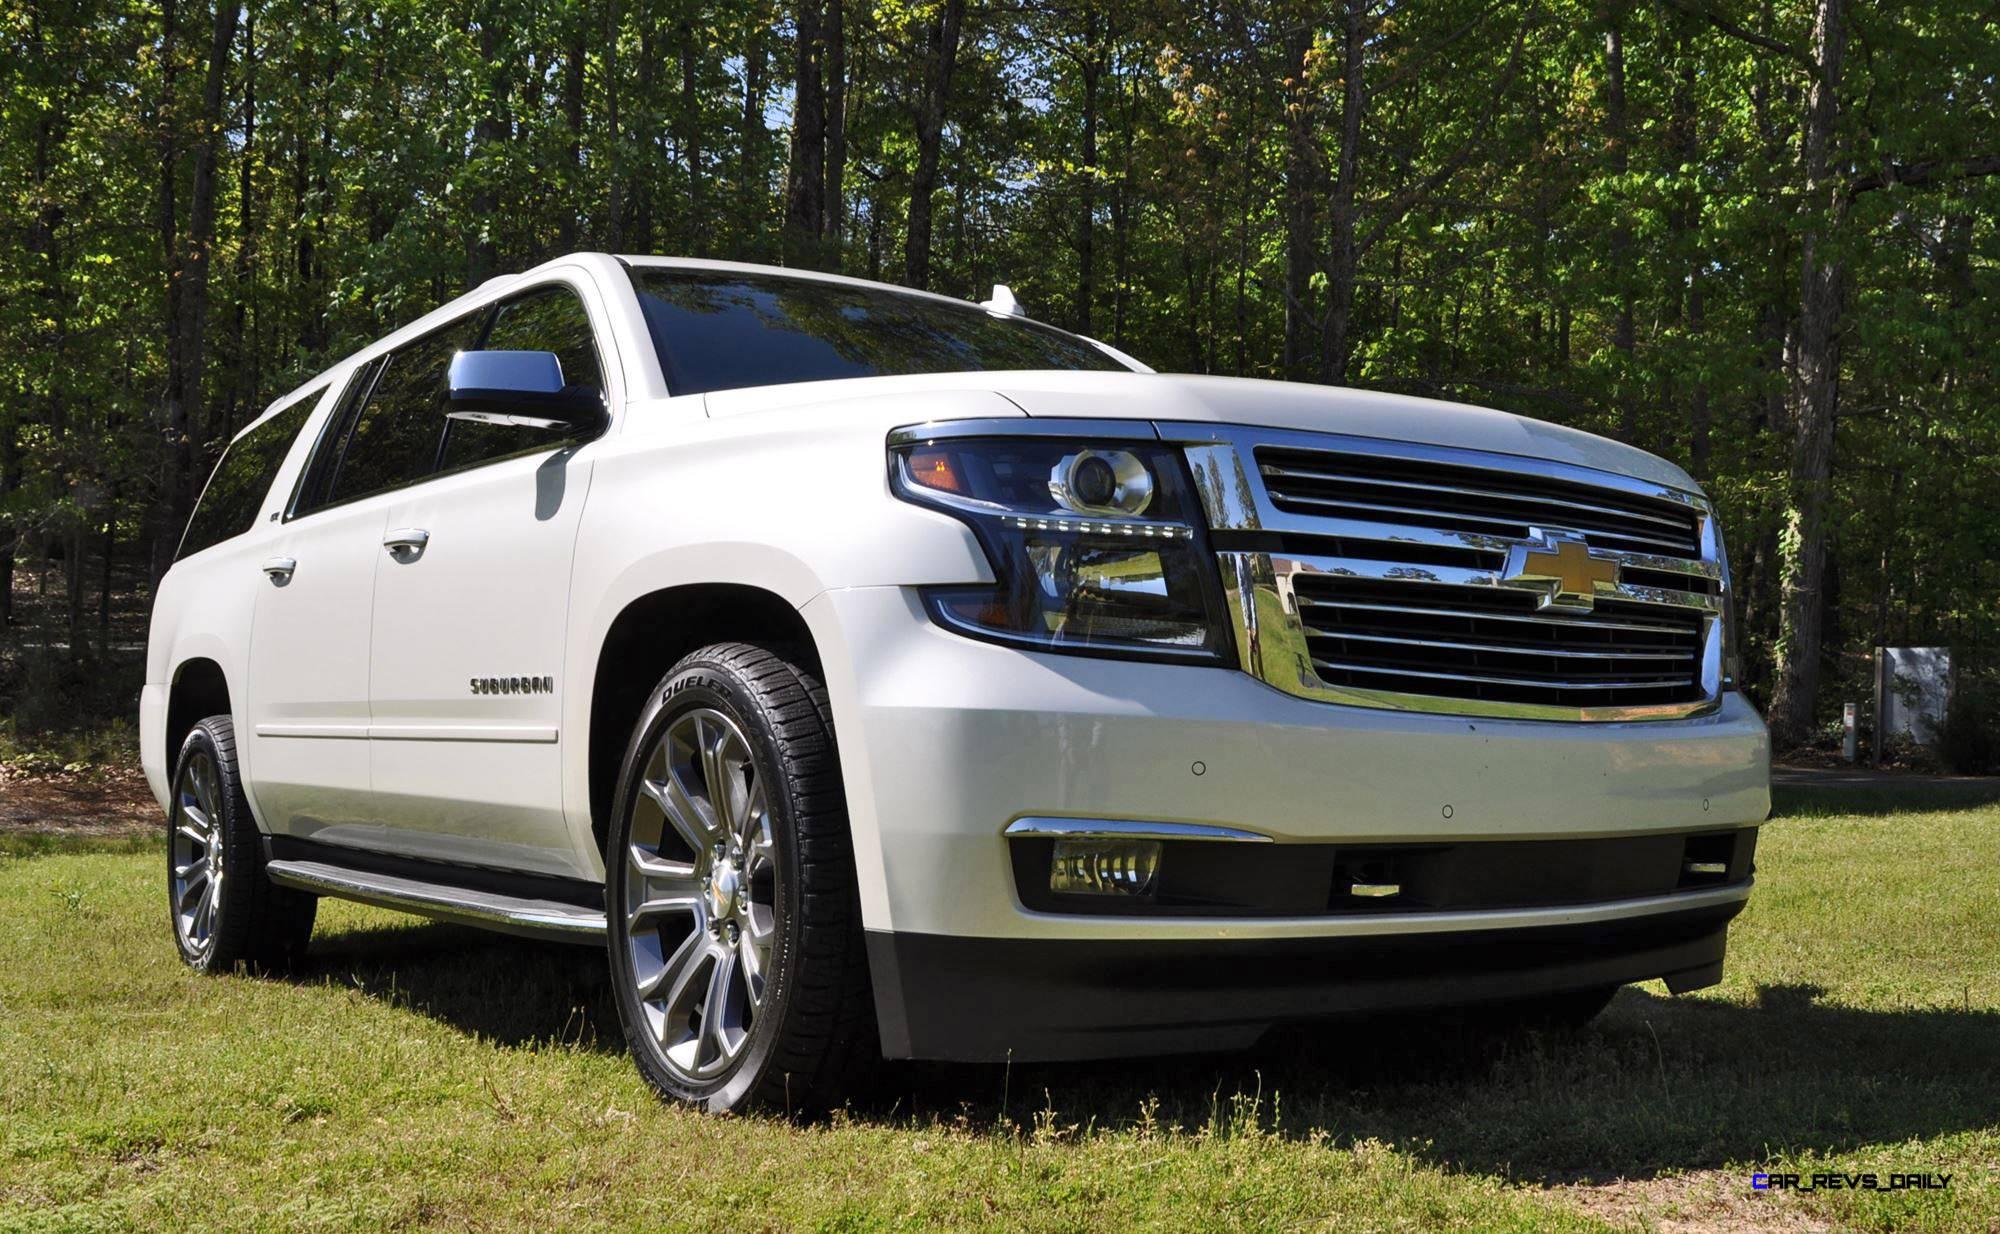 2015 Chevrolet Suburban LTZ 1 2 Ton 4WD Review